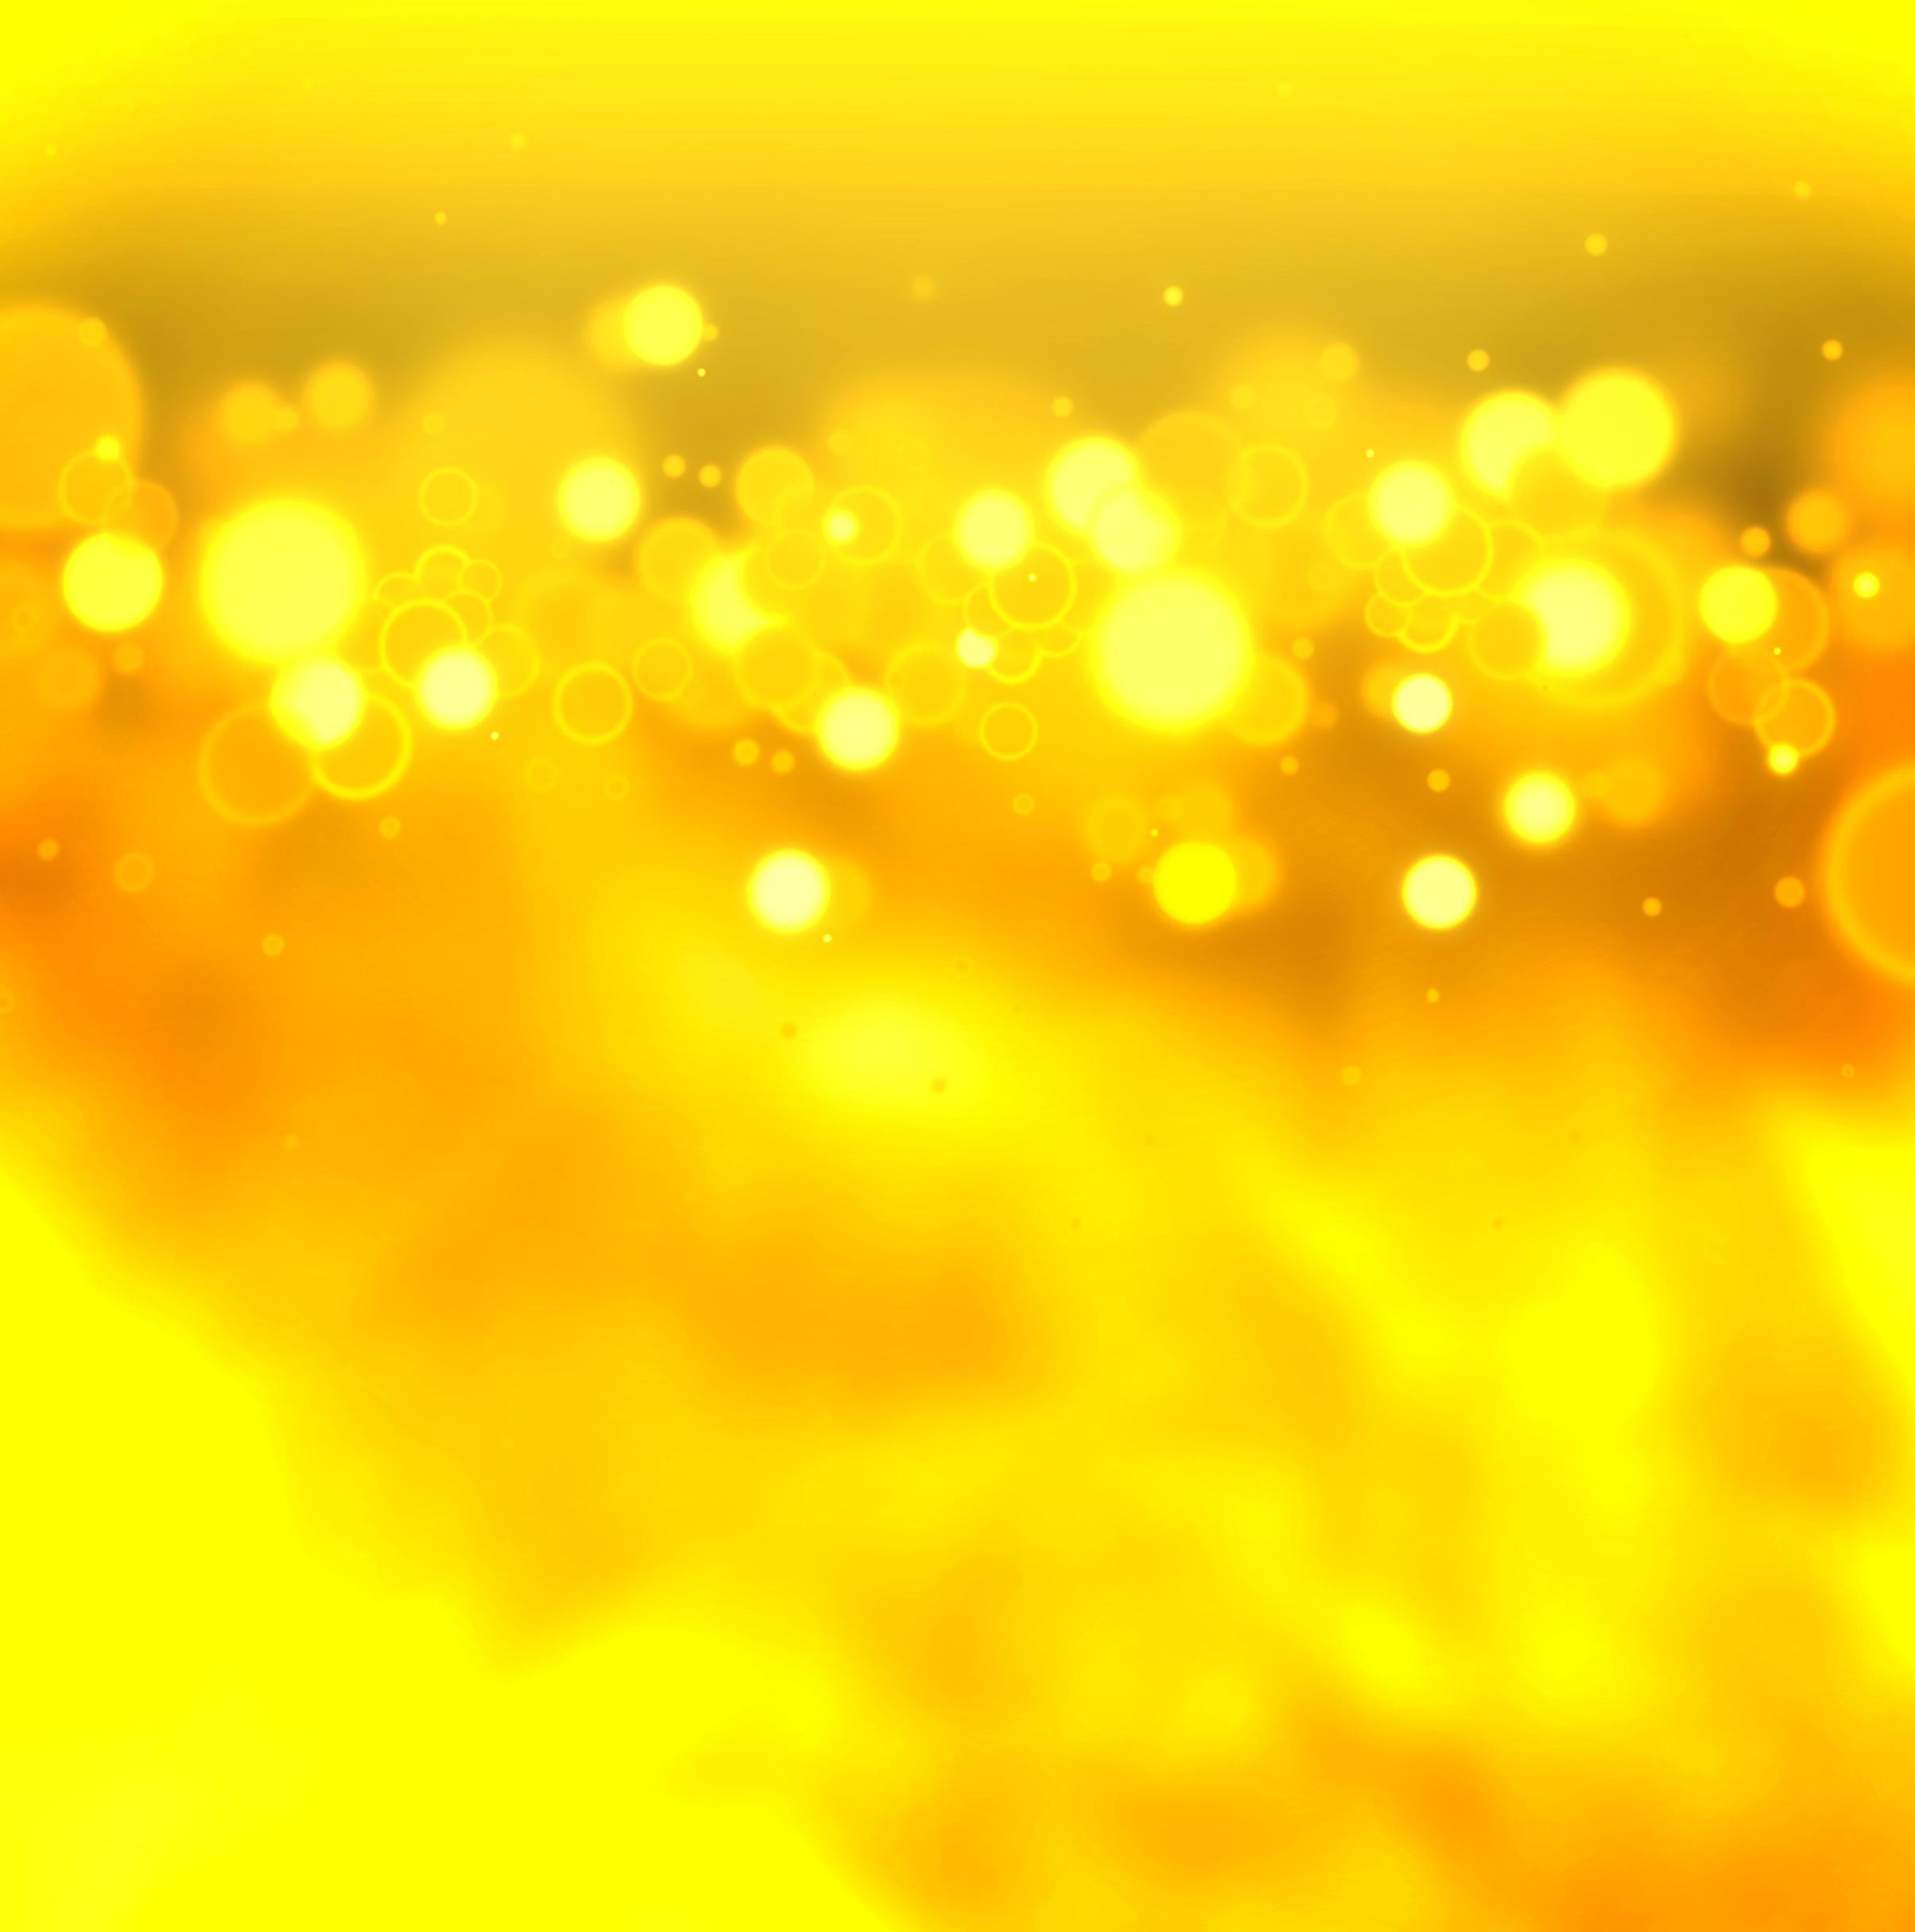 Golden bokeh on gold background, Magic, Retro, Processing, Photo, HQ Photo